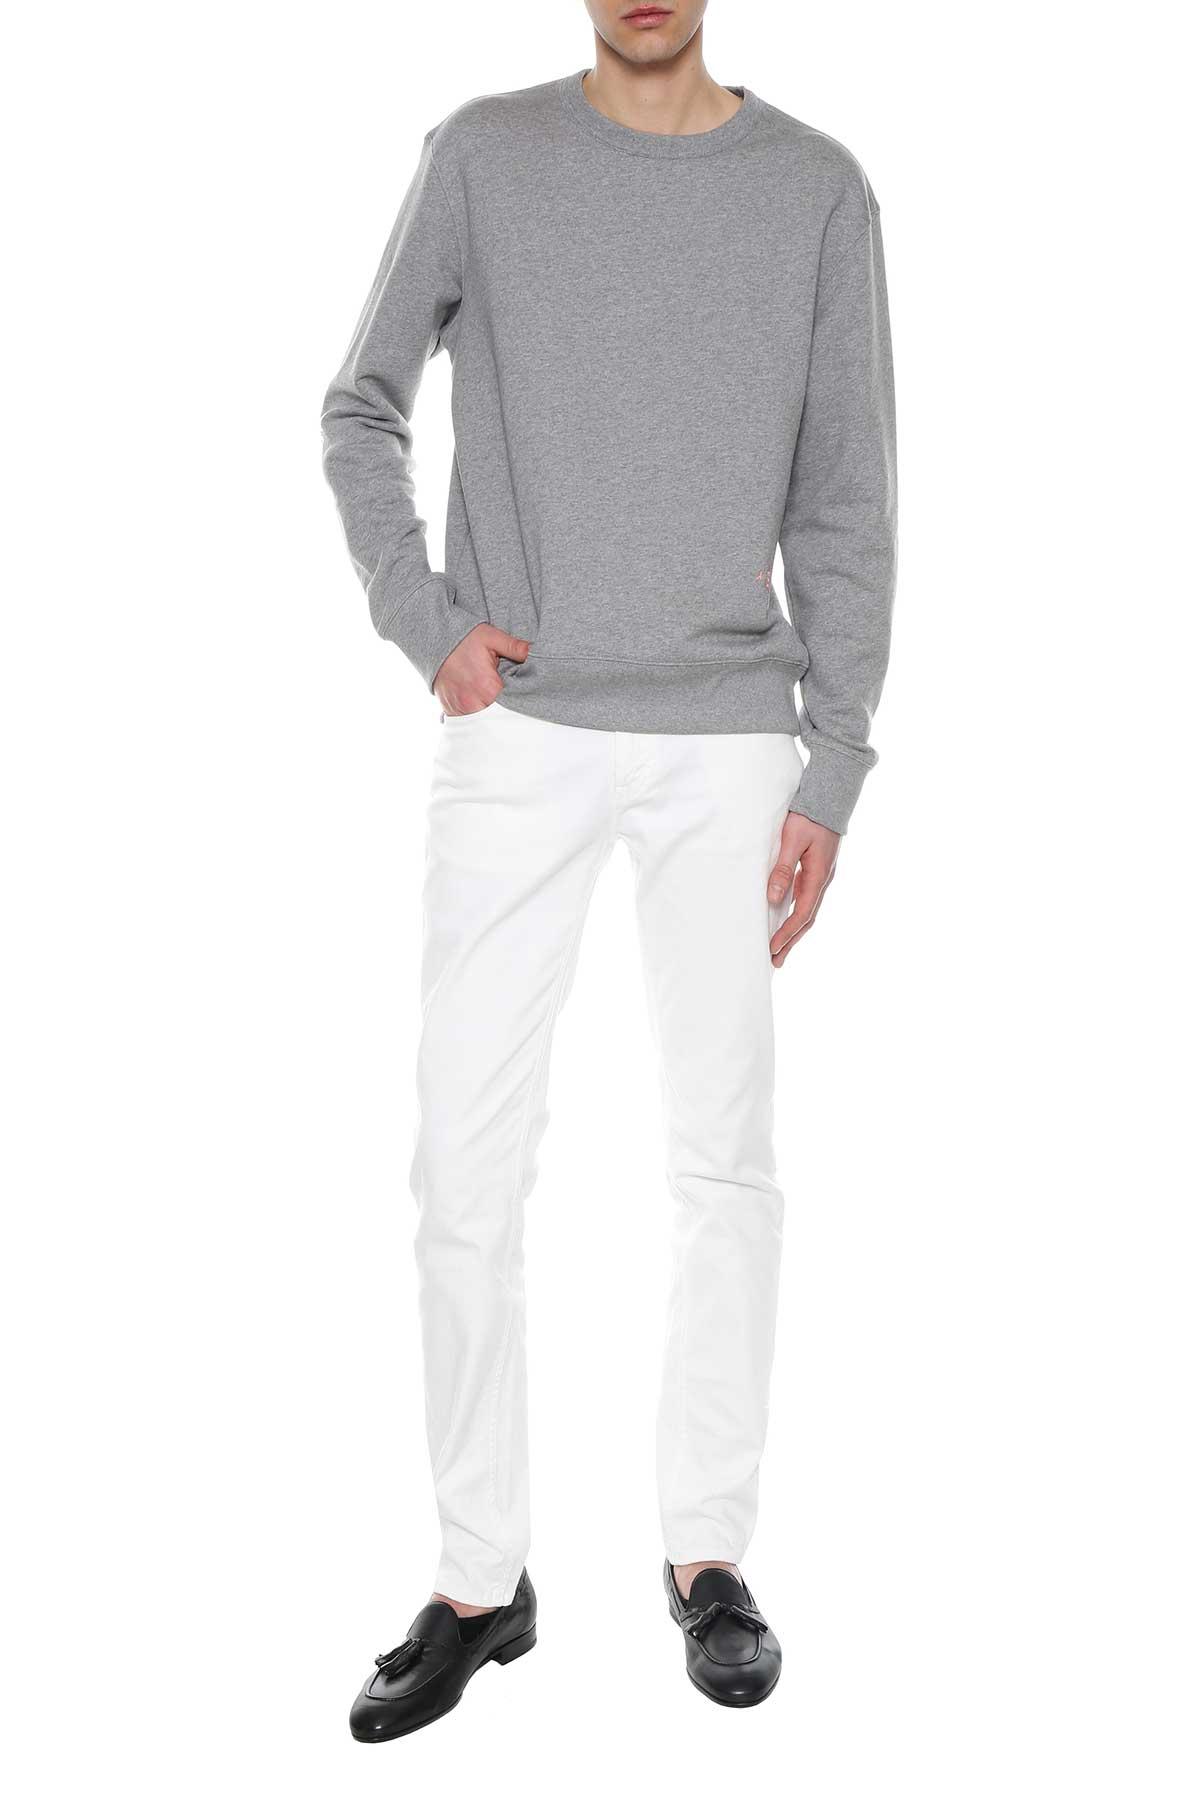 Acne Studios Acne Studios faise Sweatshirt